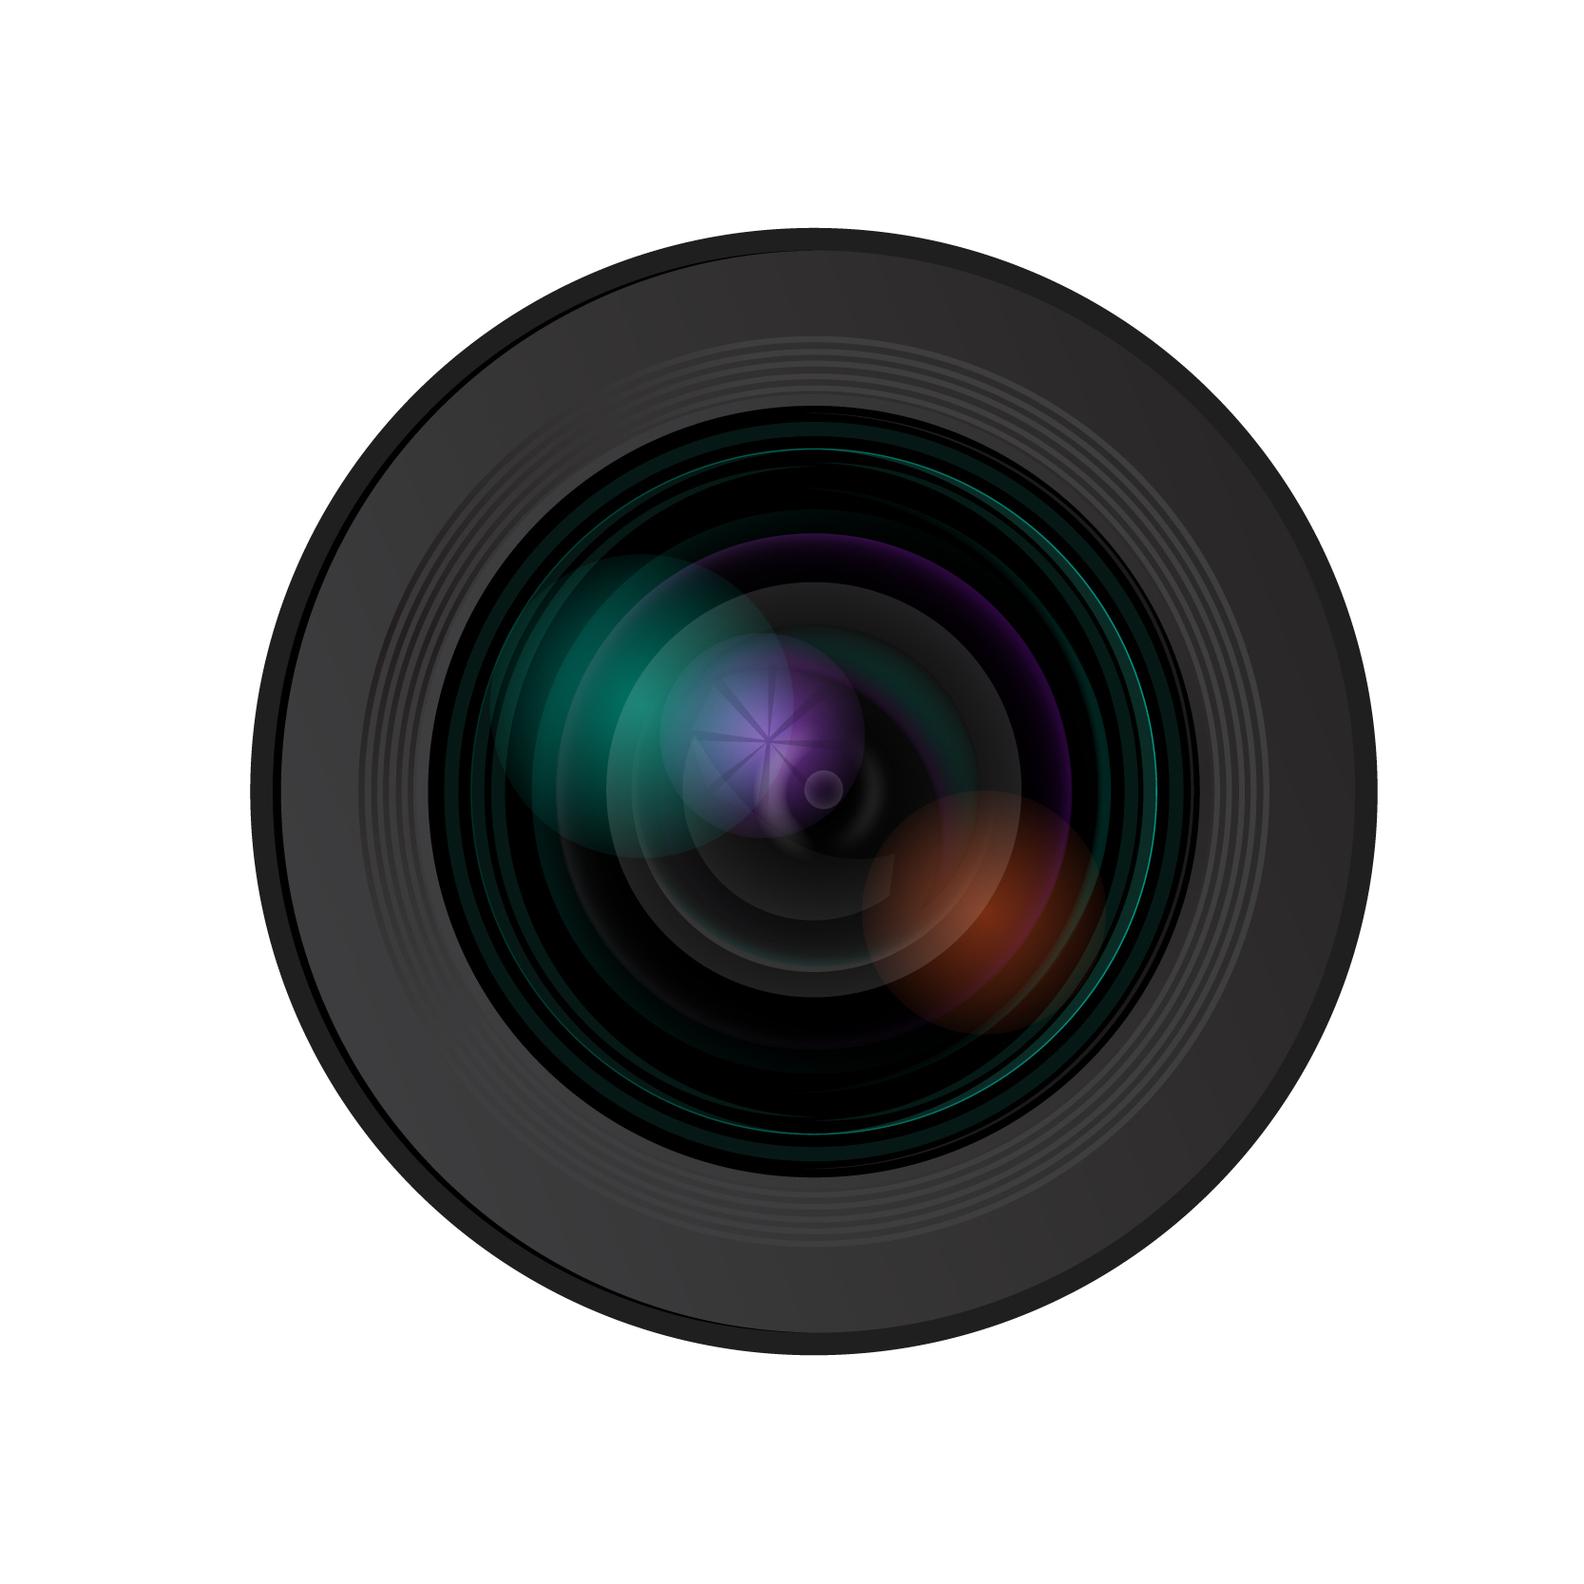 Lens Lente Clip Art At Clkercom Vector Online Clipart.